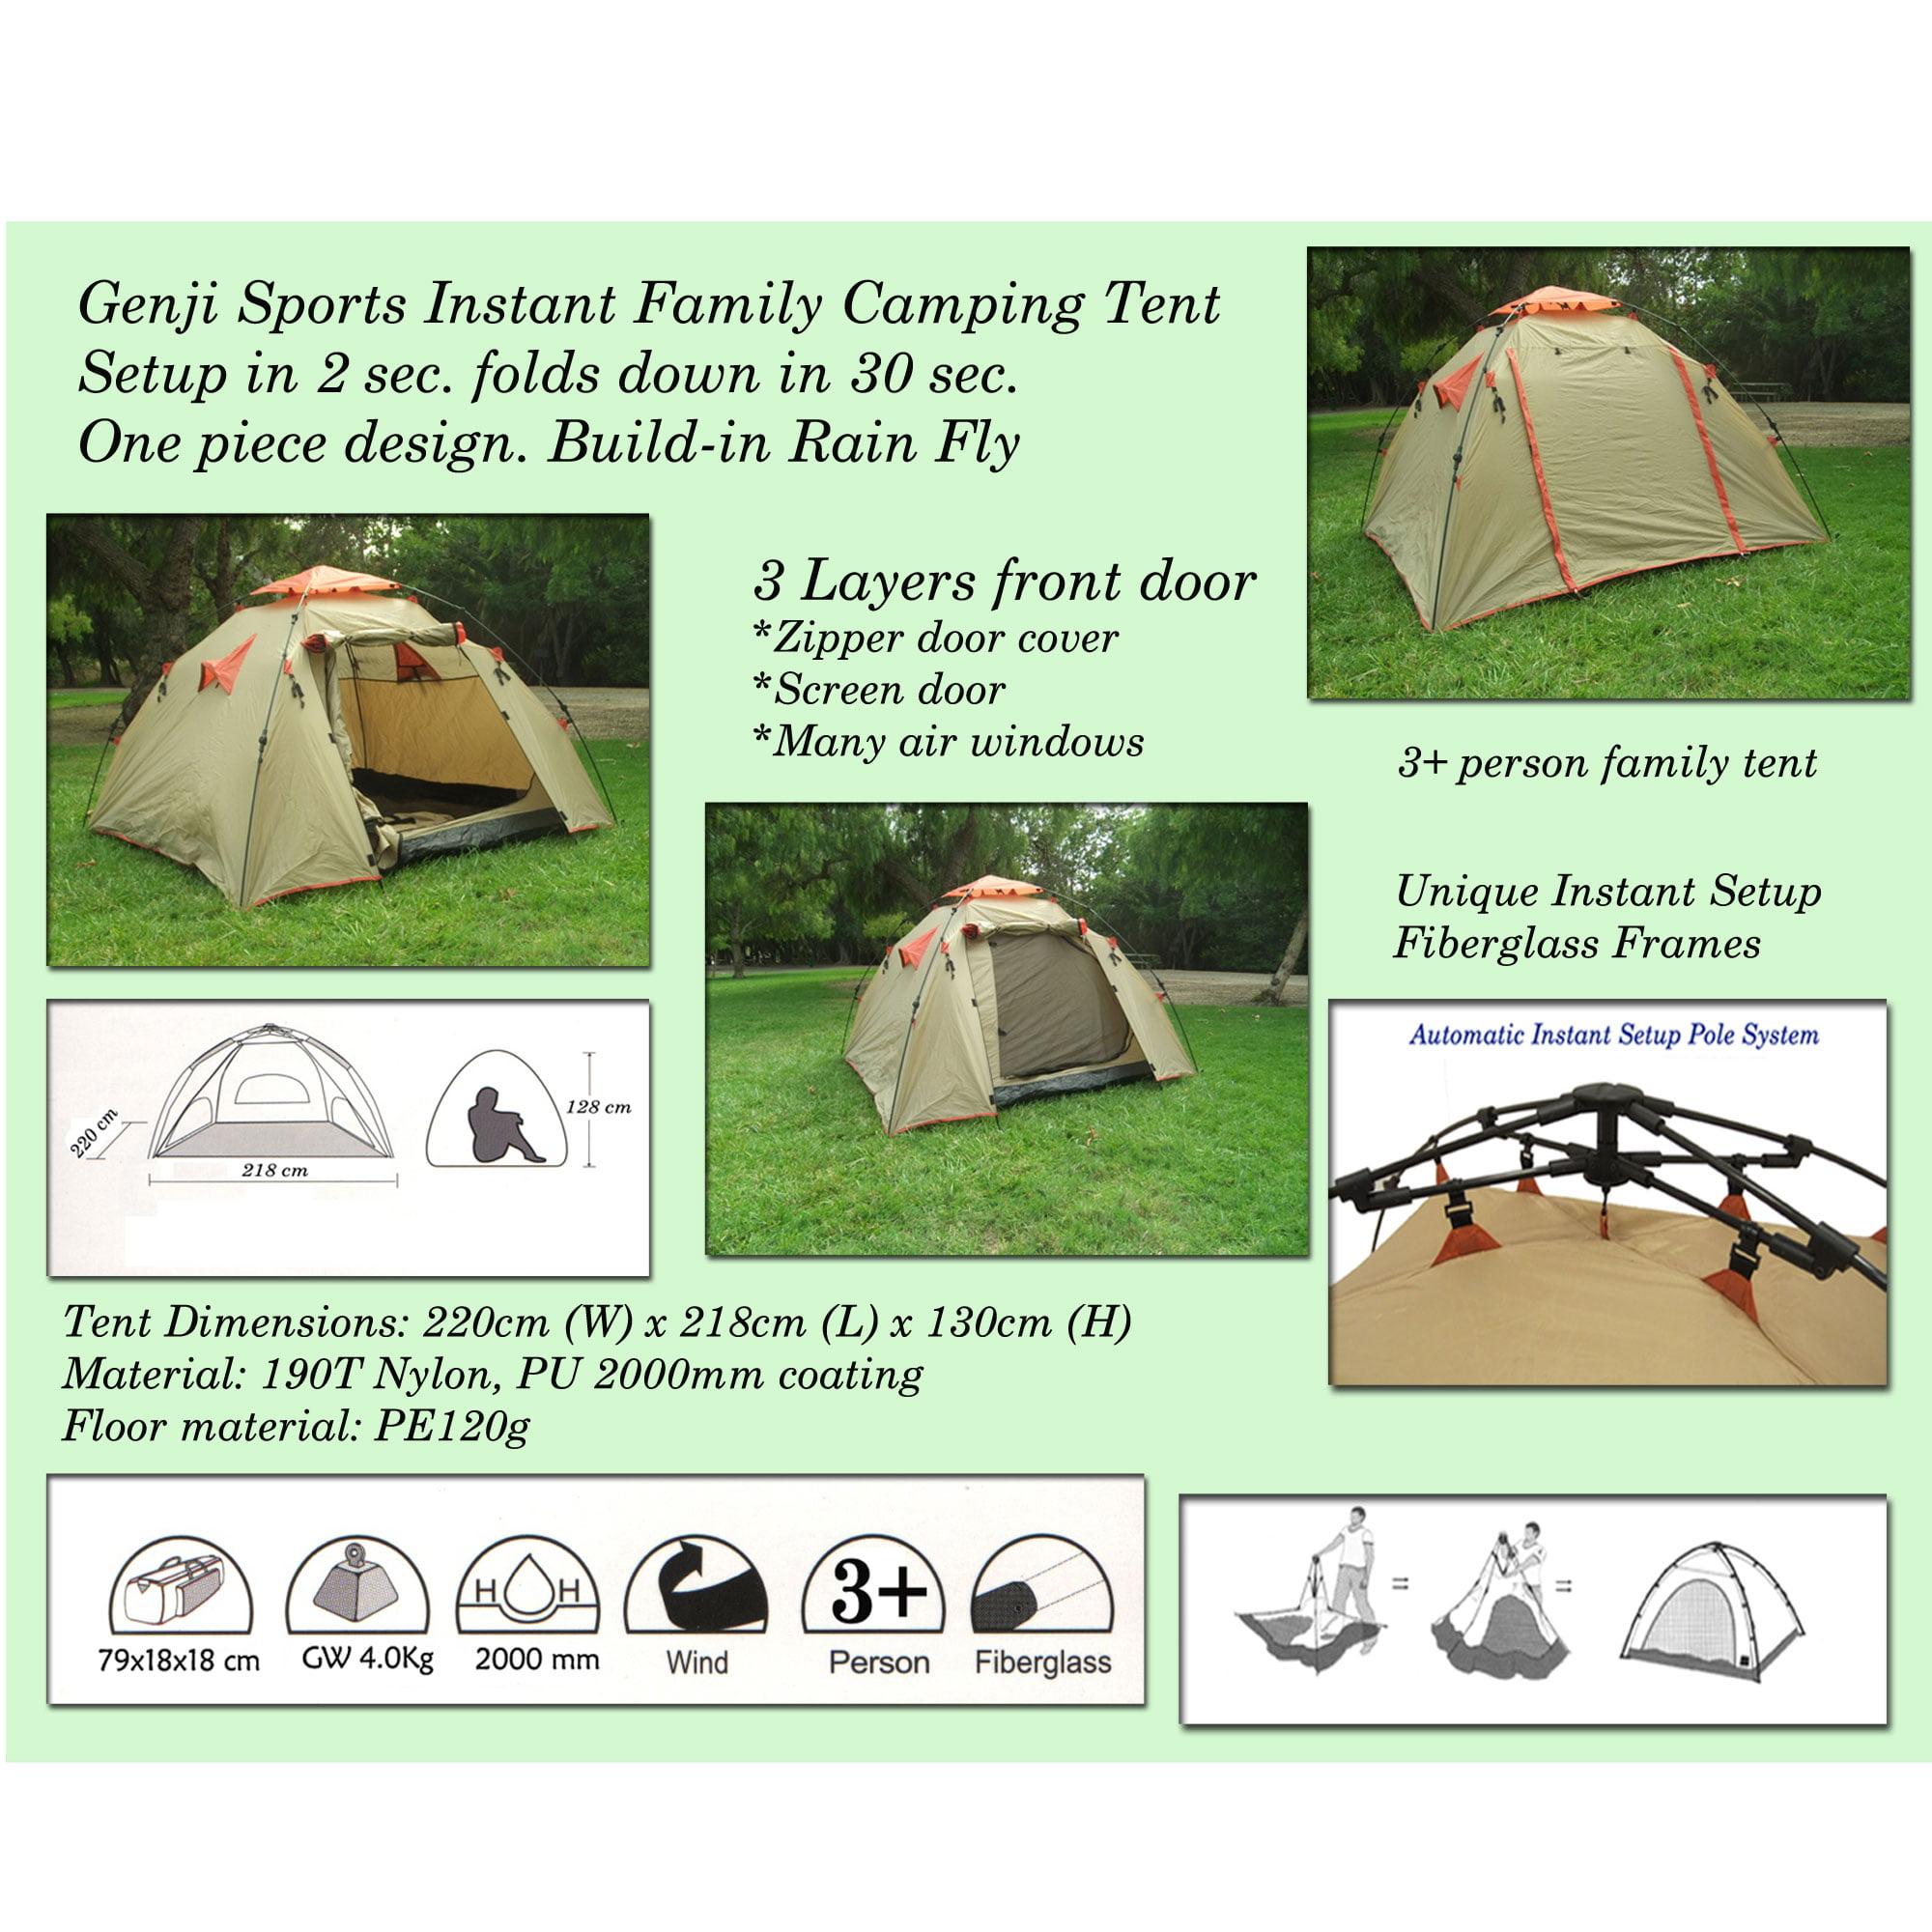 sc 1 st  Walmart & Genji Sports Instant Family Camping Tent 3P - Walmart.com